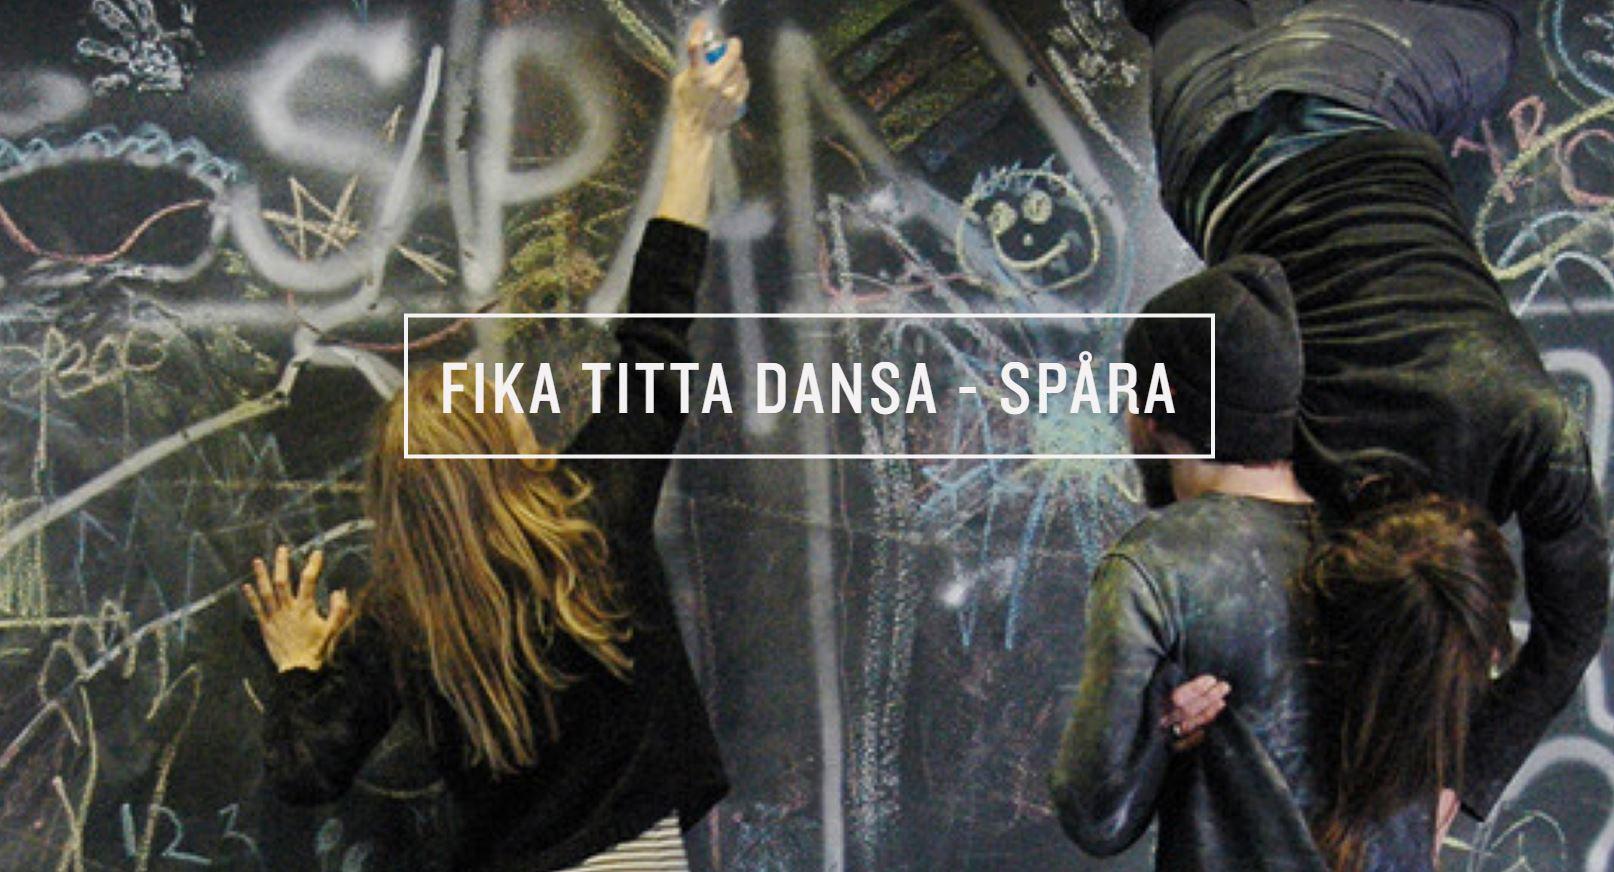 fika_titta_dansa_spara_klipp